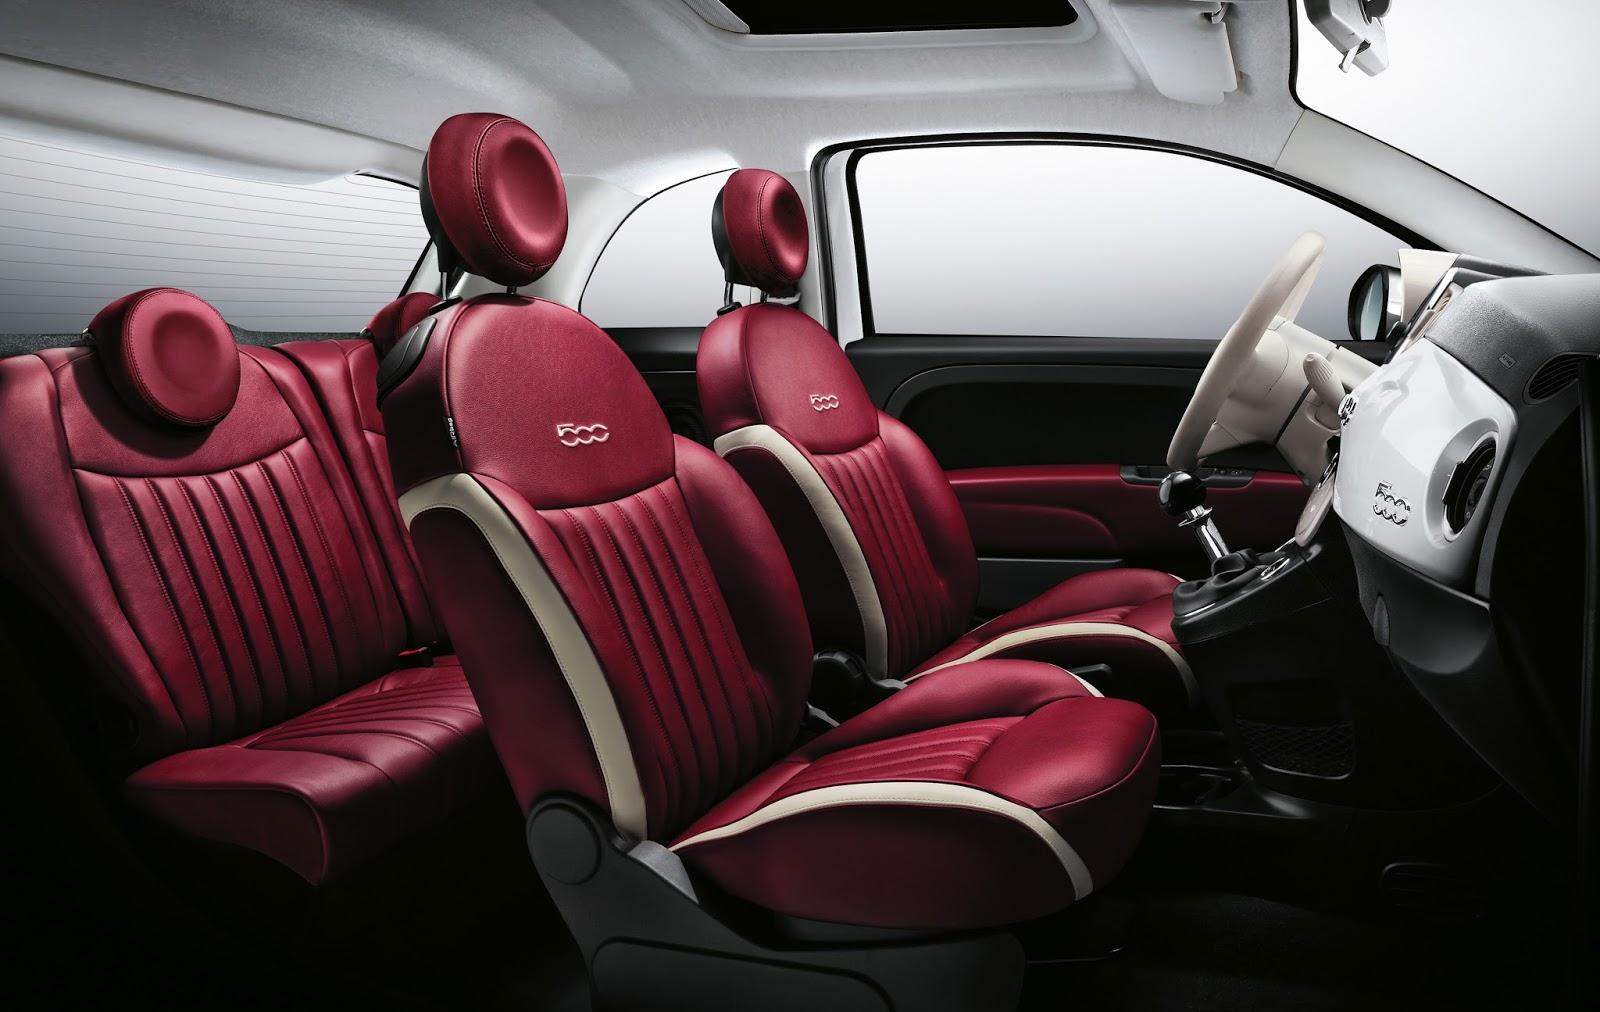 150703 FIAT Nuova 500 42 Η άφιξη του νέου Fiat 500 είναι γεγονός